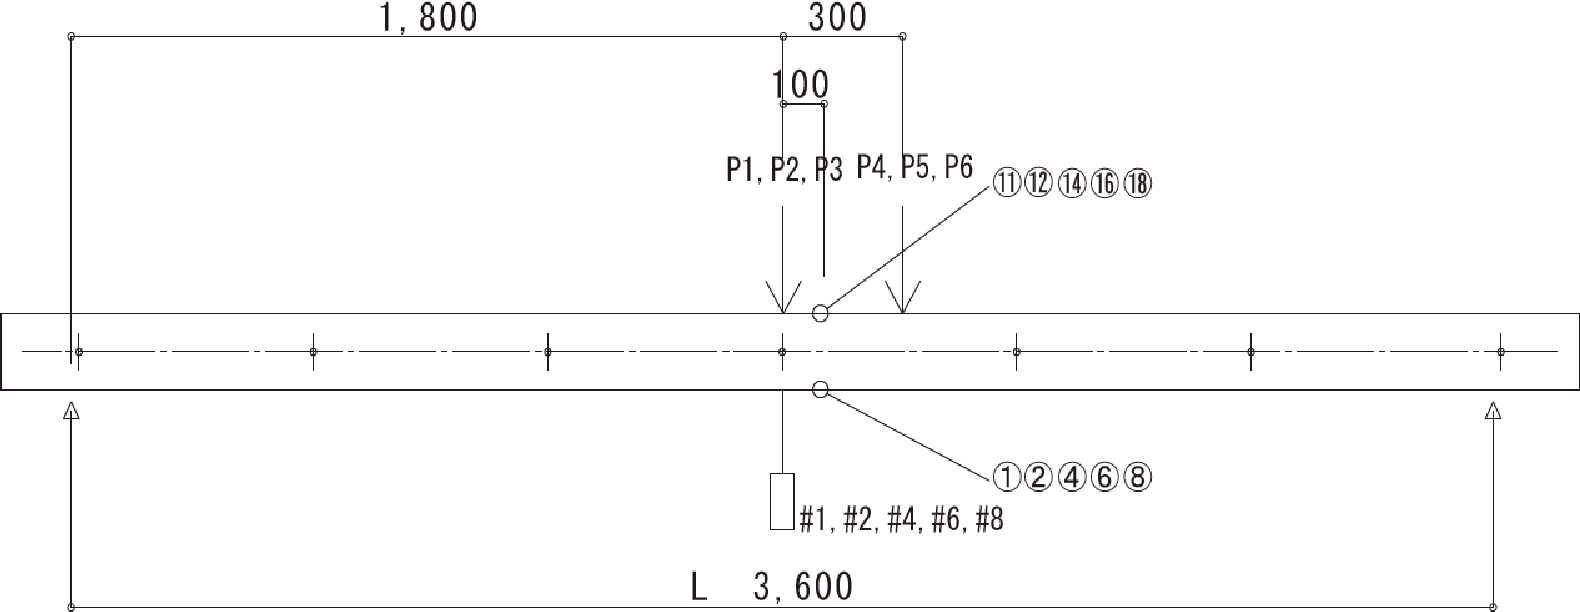 加力位置と変位計位置(2)